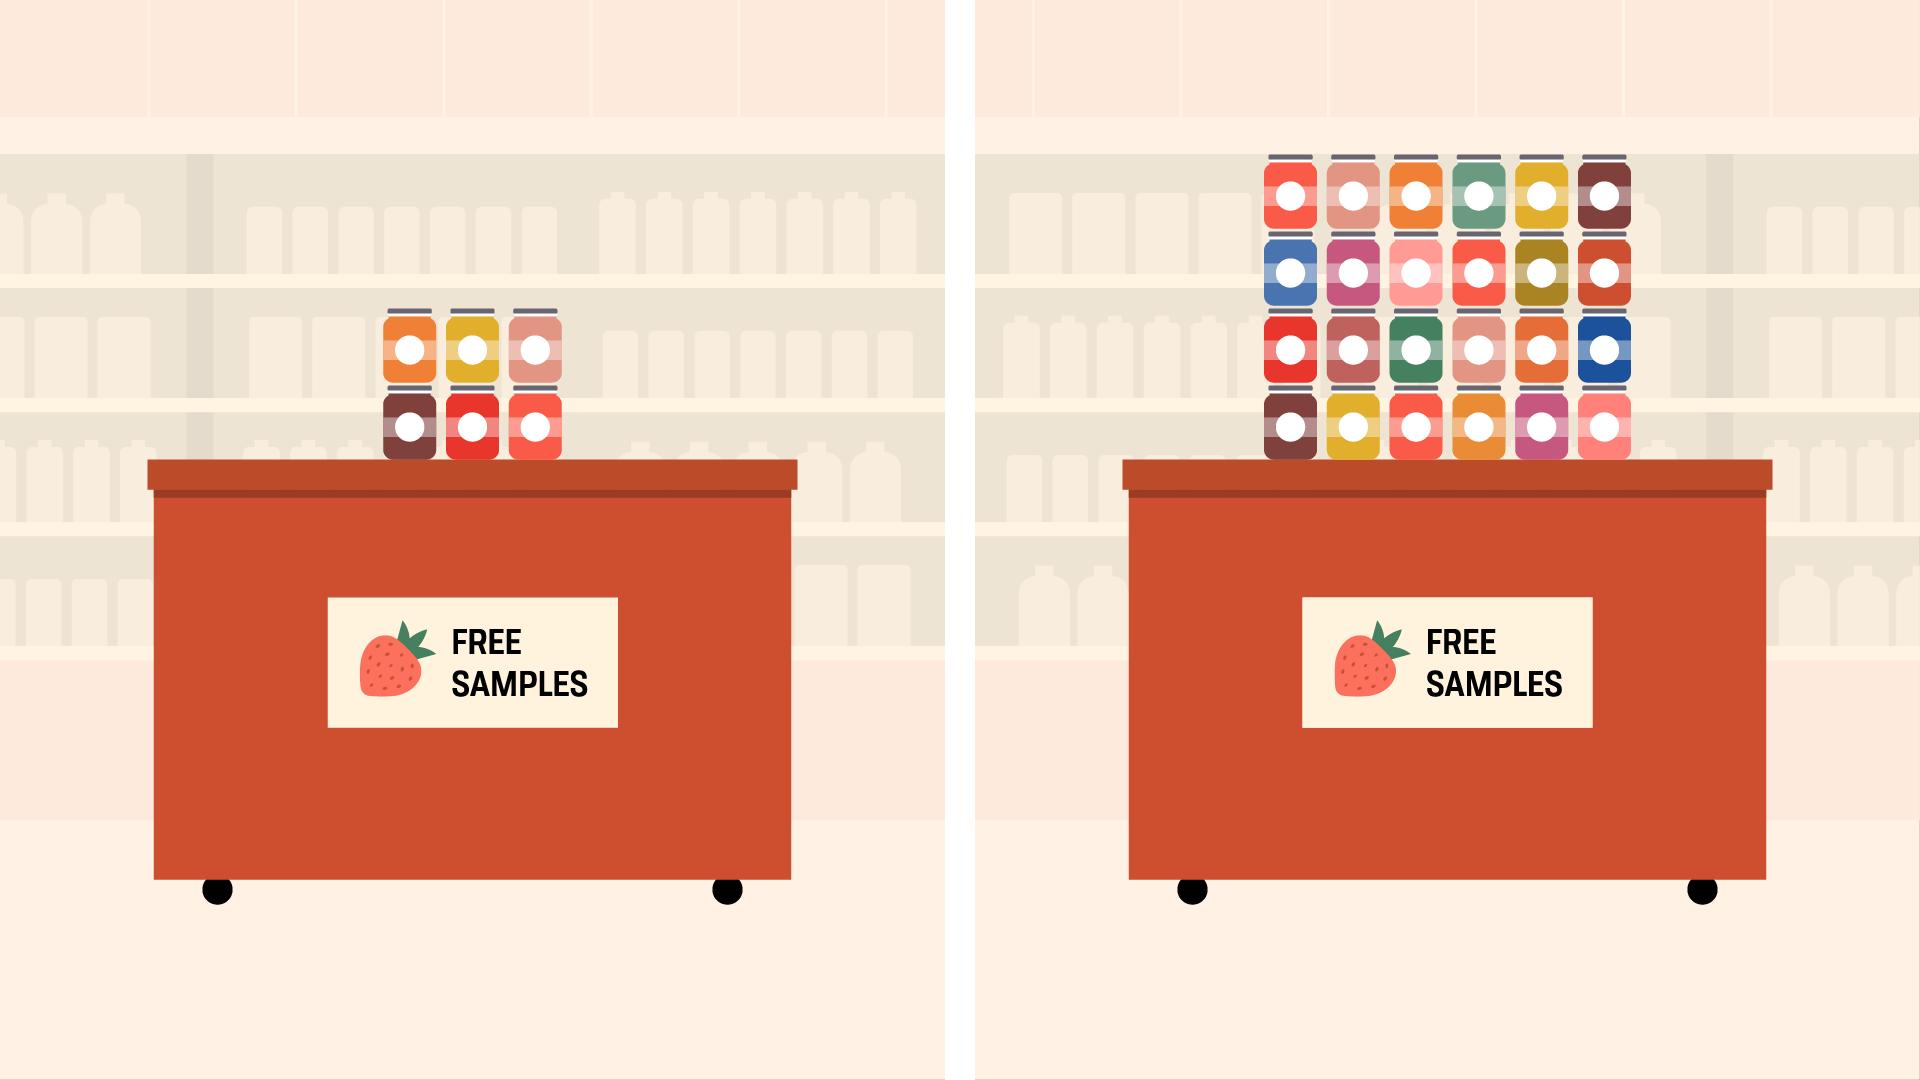 dislay with 6 samples, dislpay with 24 samples